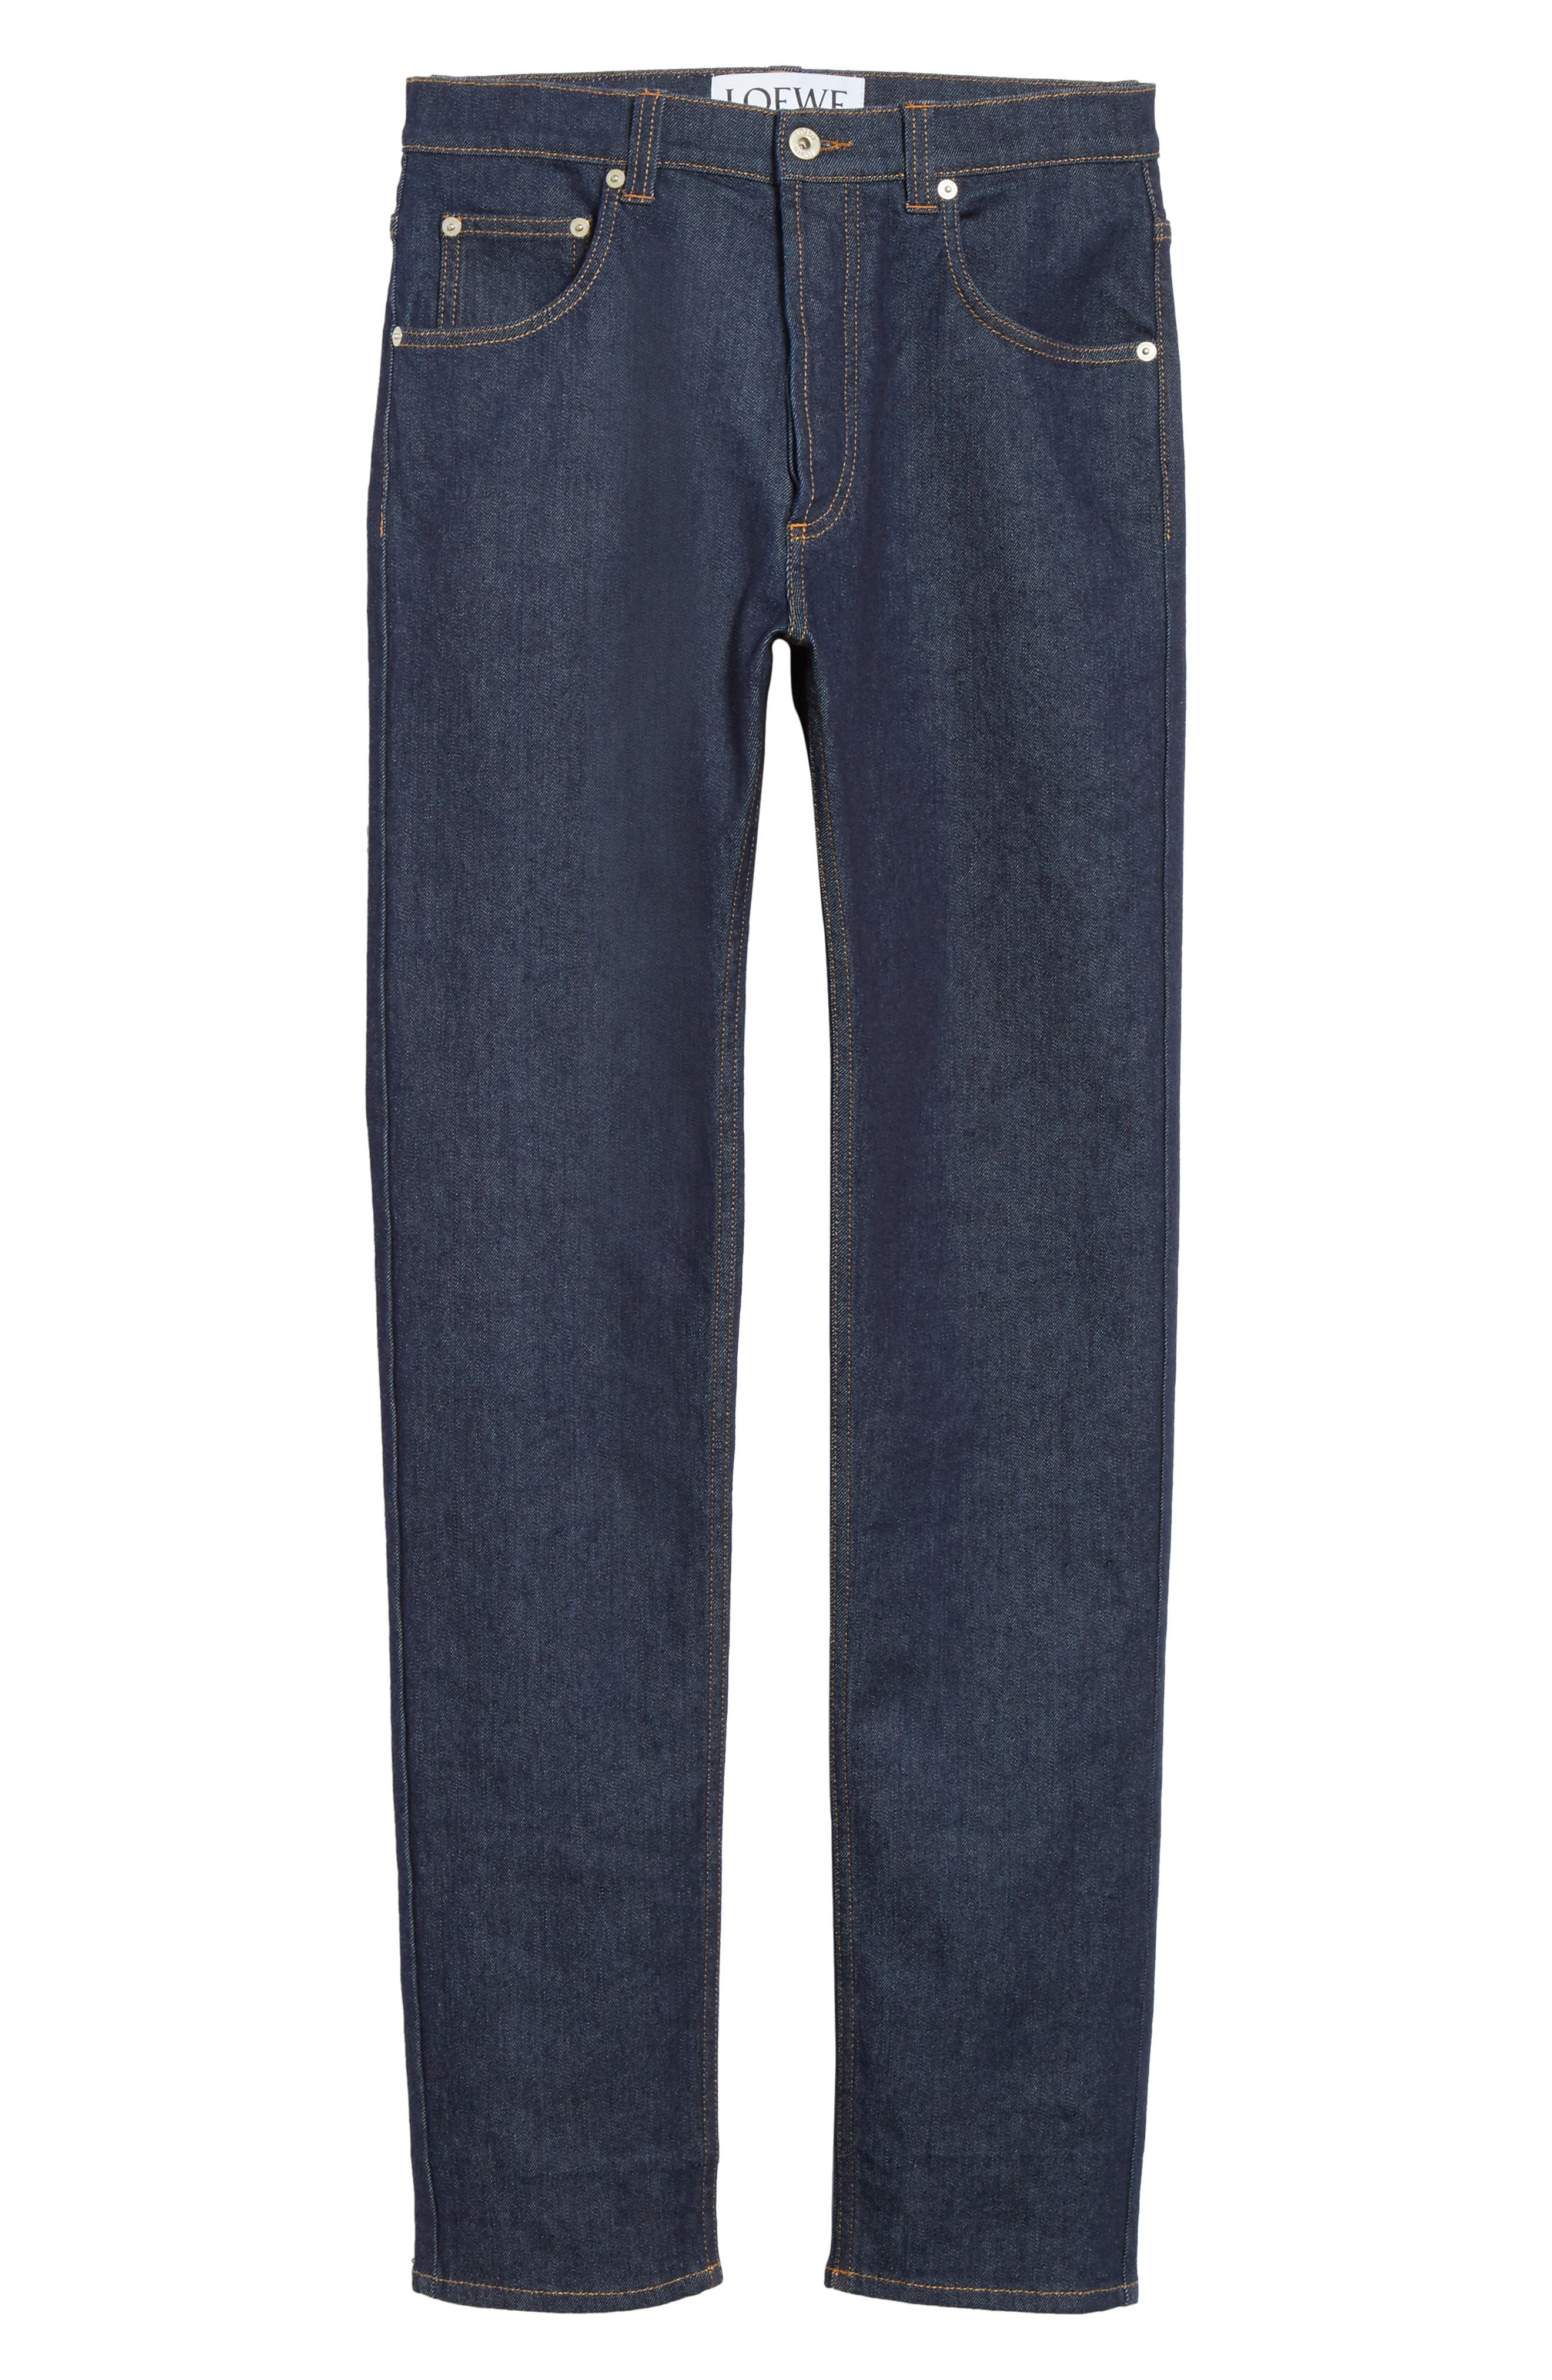 Skinny Fit Jeans,                             Alternate thumbnail 6, color,                             491